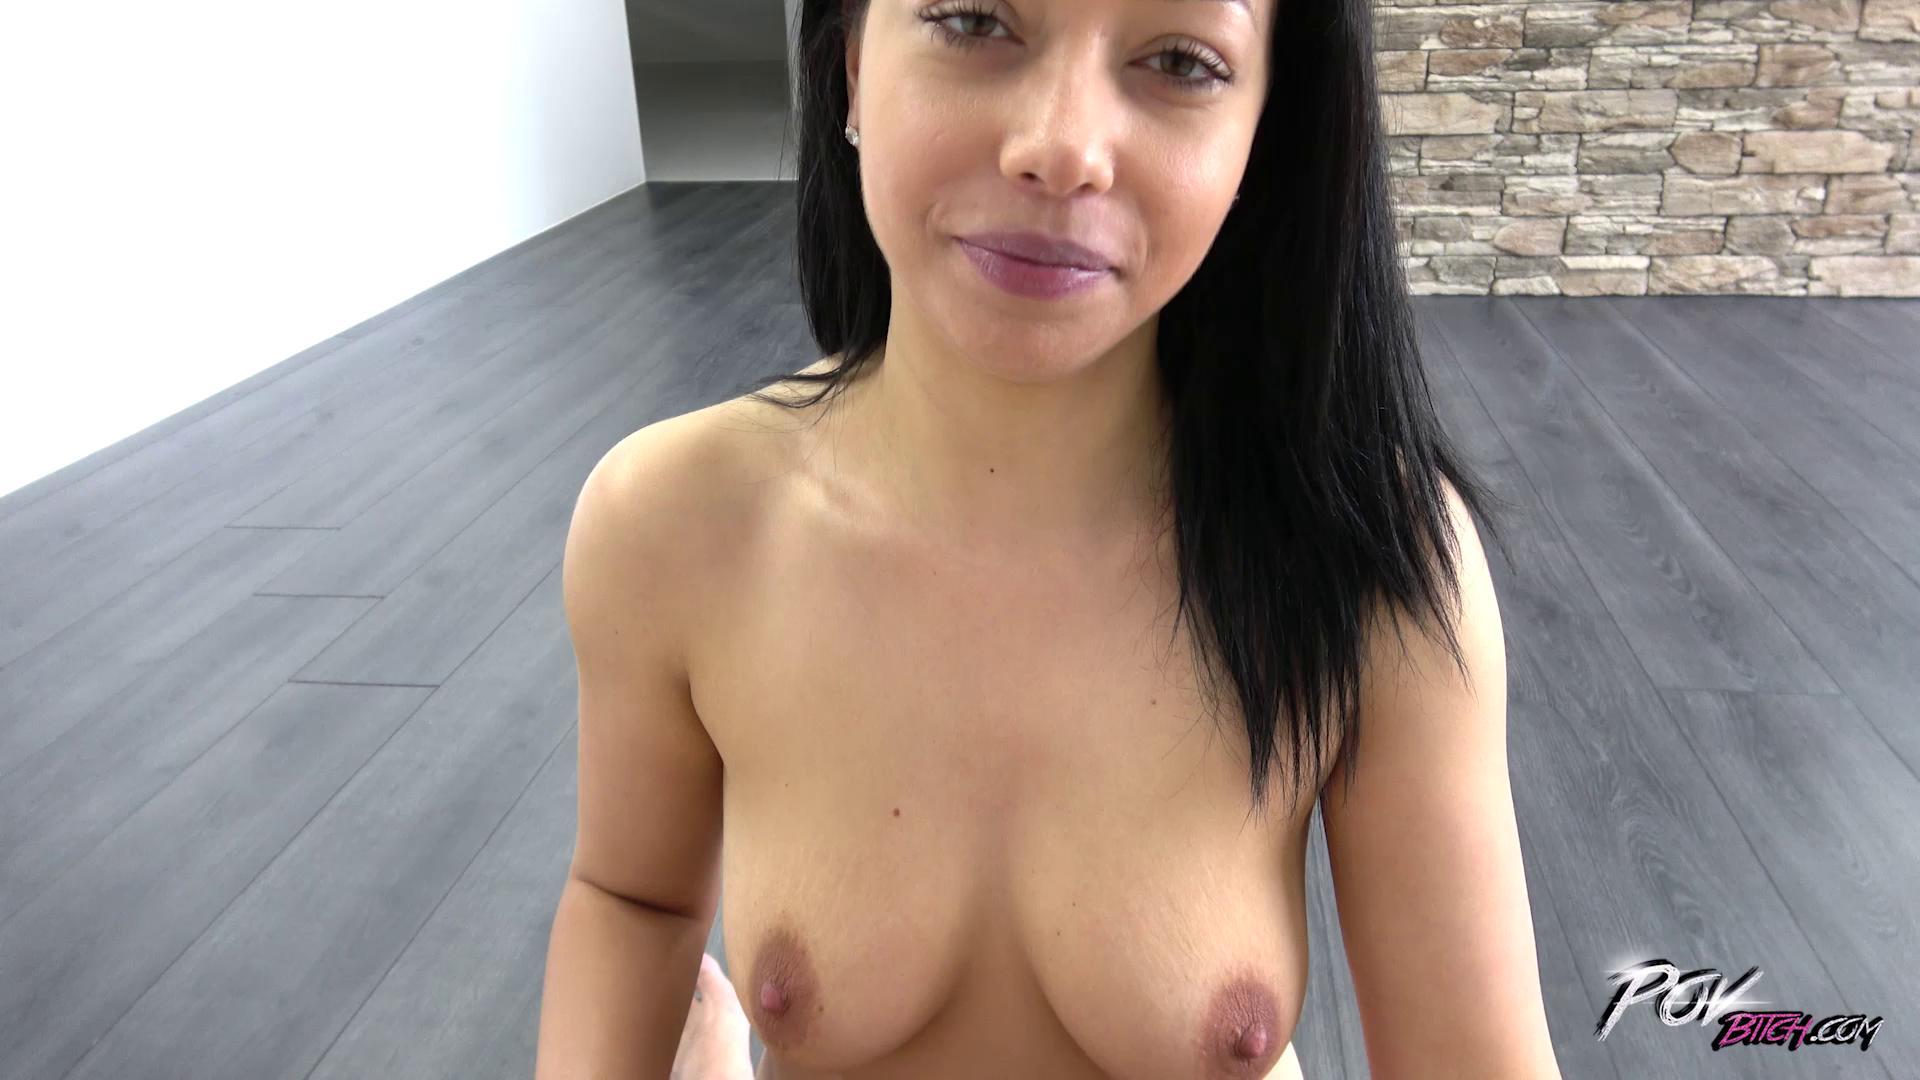 POVBitch – Carrie Cruz Exotic Bitch Show Great Tits